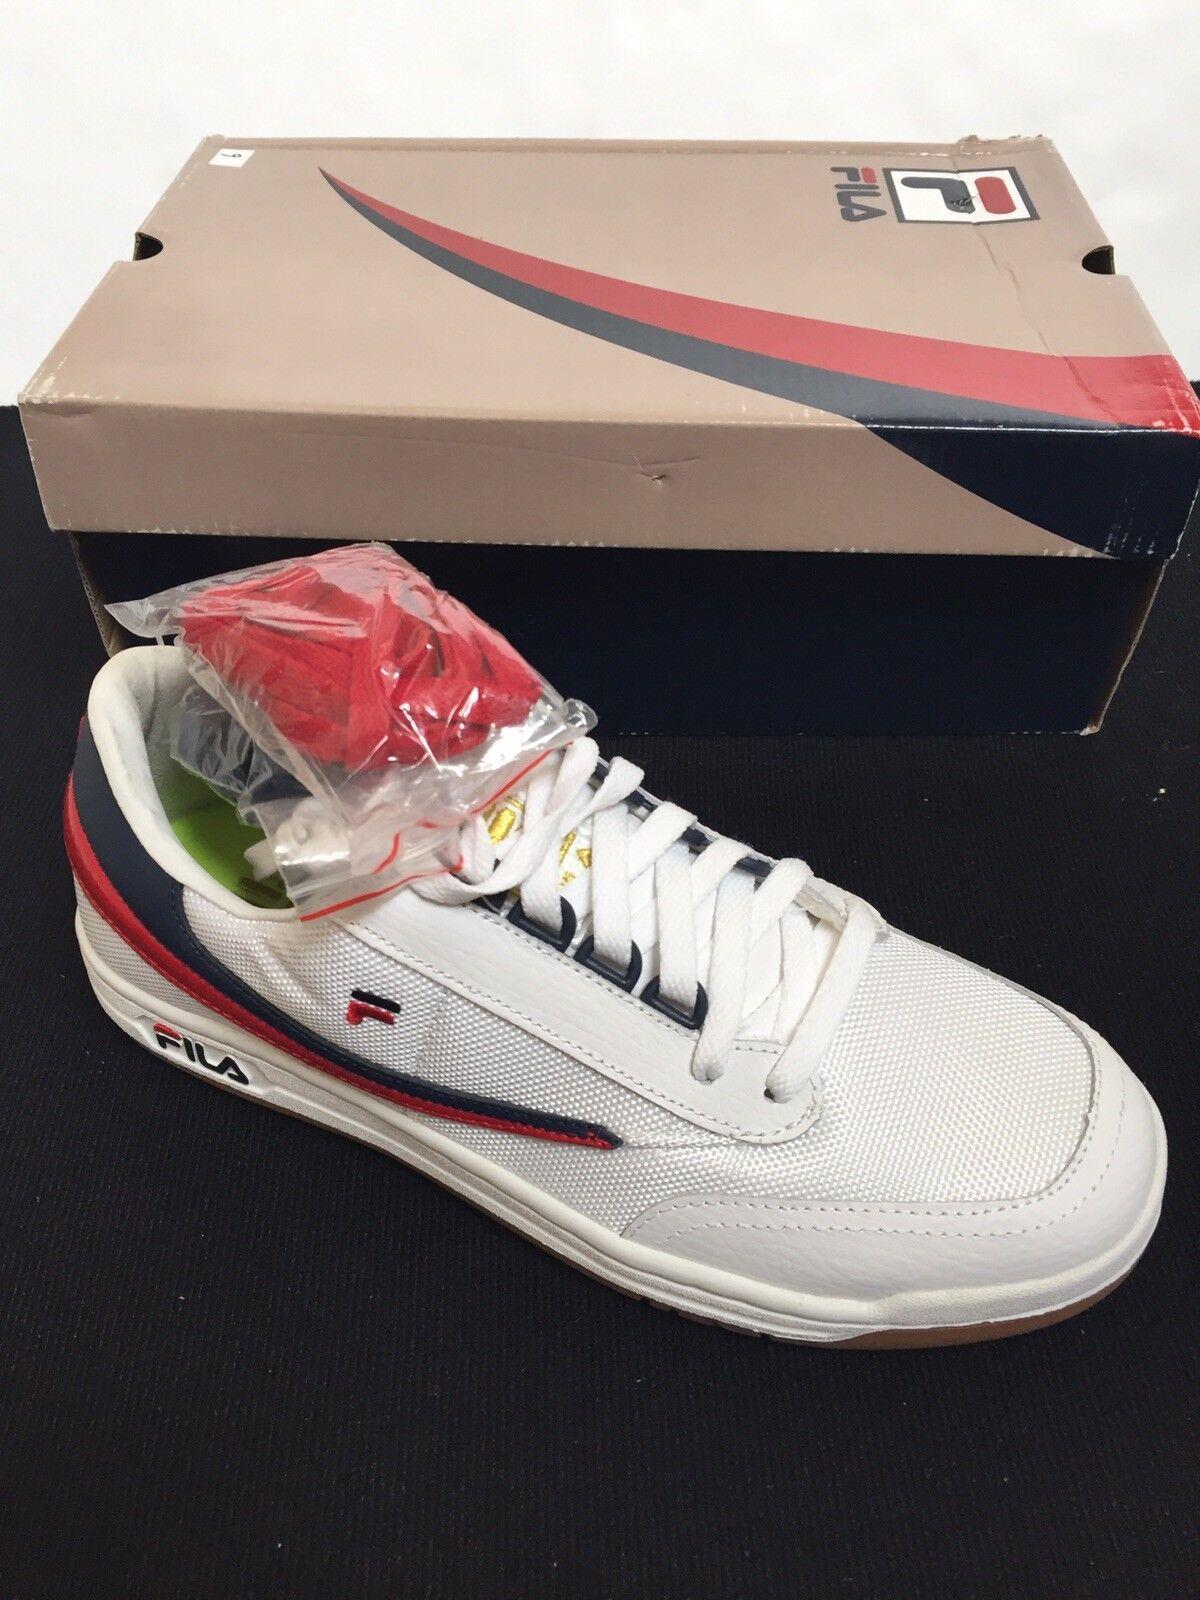 Fila Original Tennis  Uomo Size 9.5  white navy red gold 13017 167